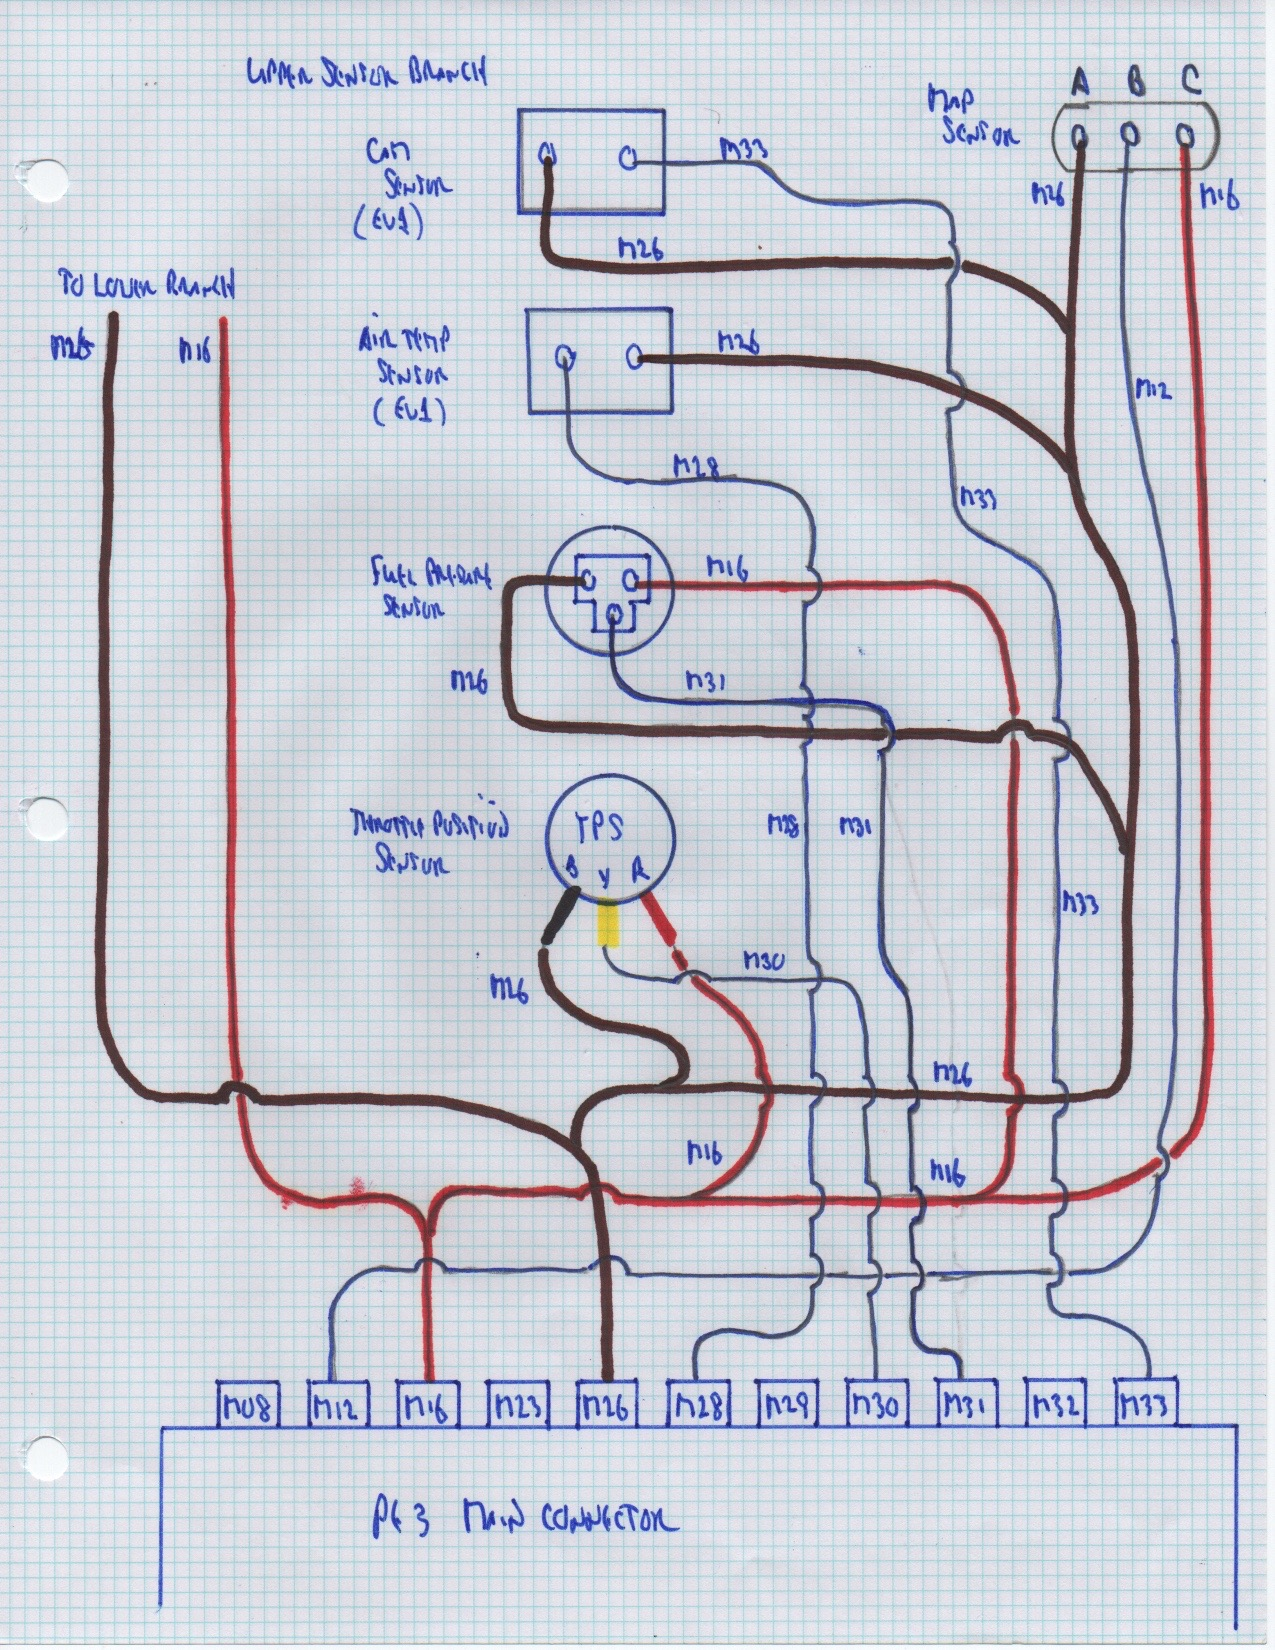 upper sensor branch wiring diagram junk yard zetec i bundled the wiring for the sensors that [ 1275 x 1650 Pixel ]